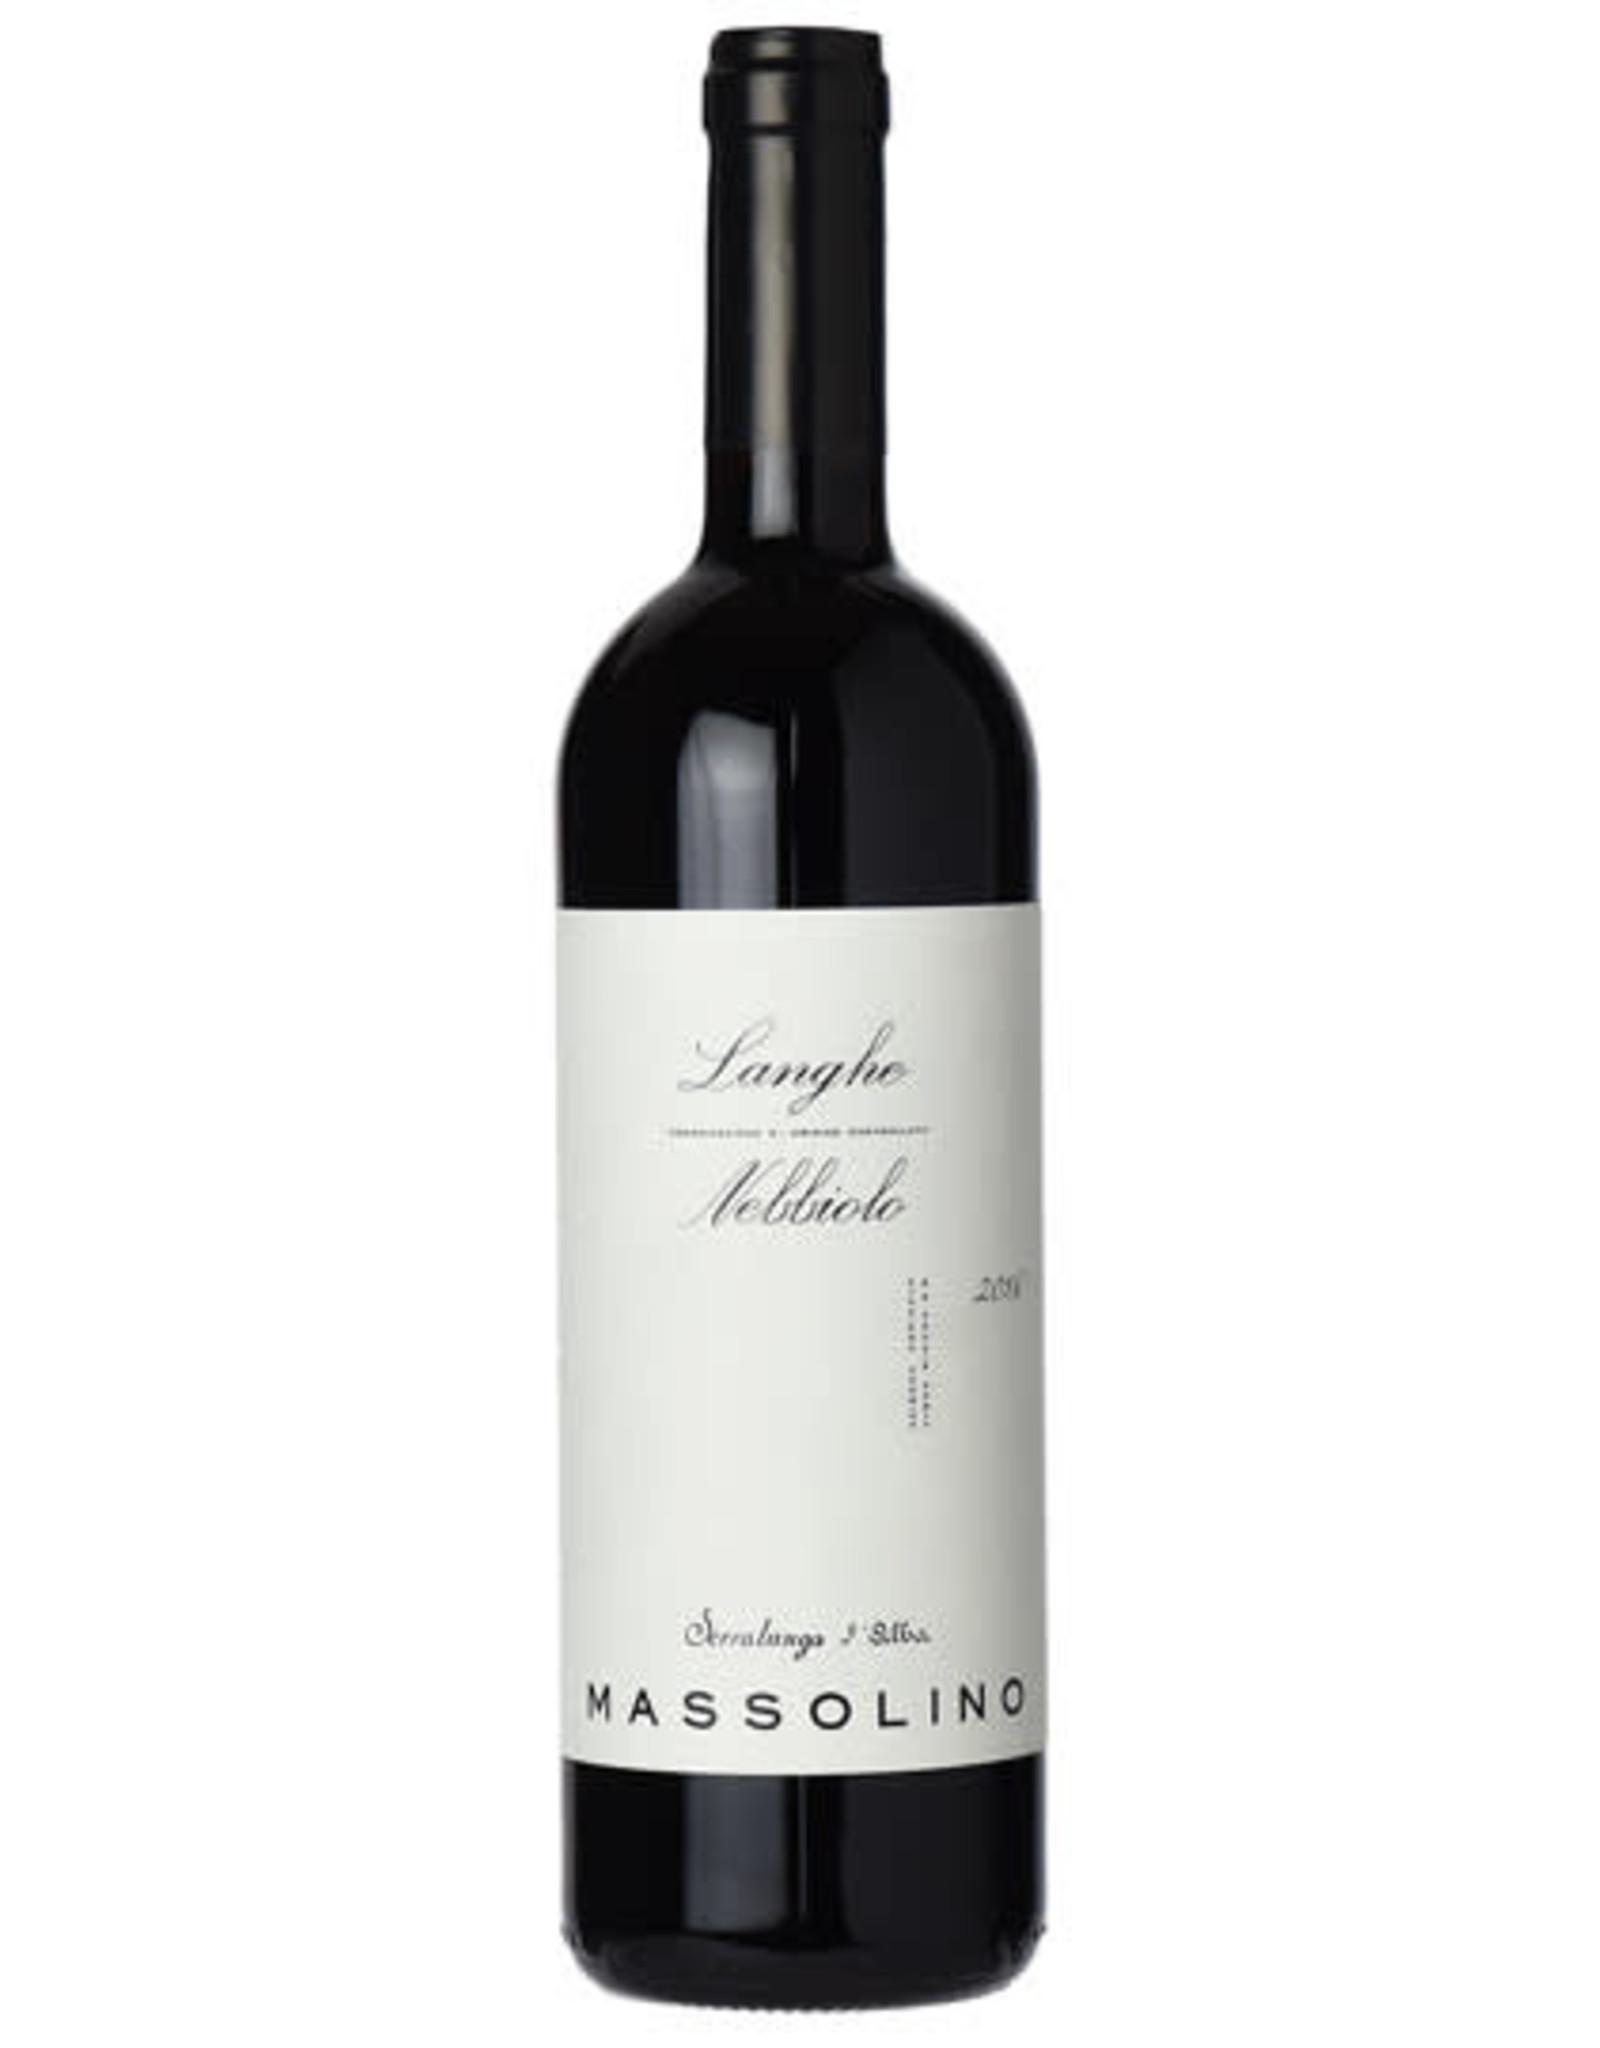 Massolino Serralunga d'Alba Langhe Nebbiolo 2016